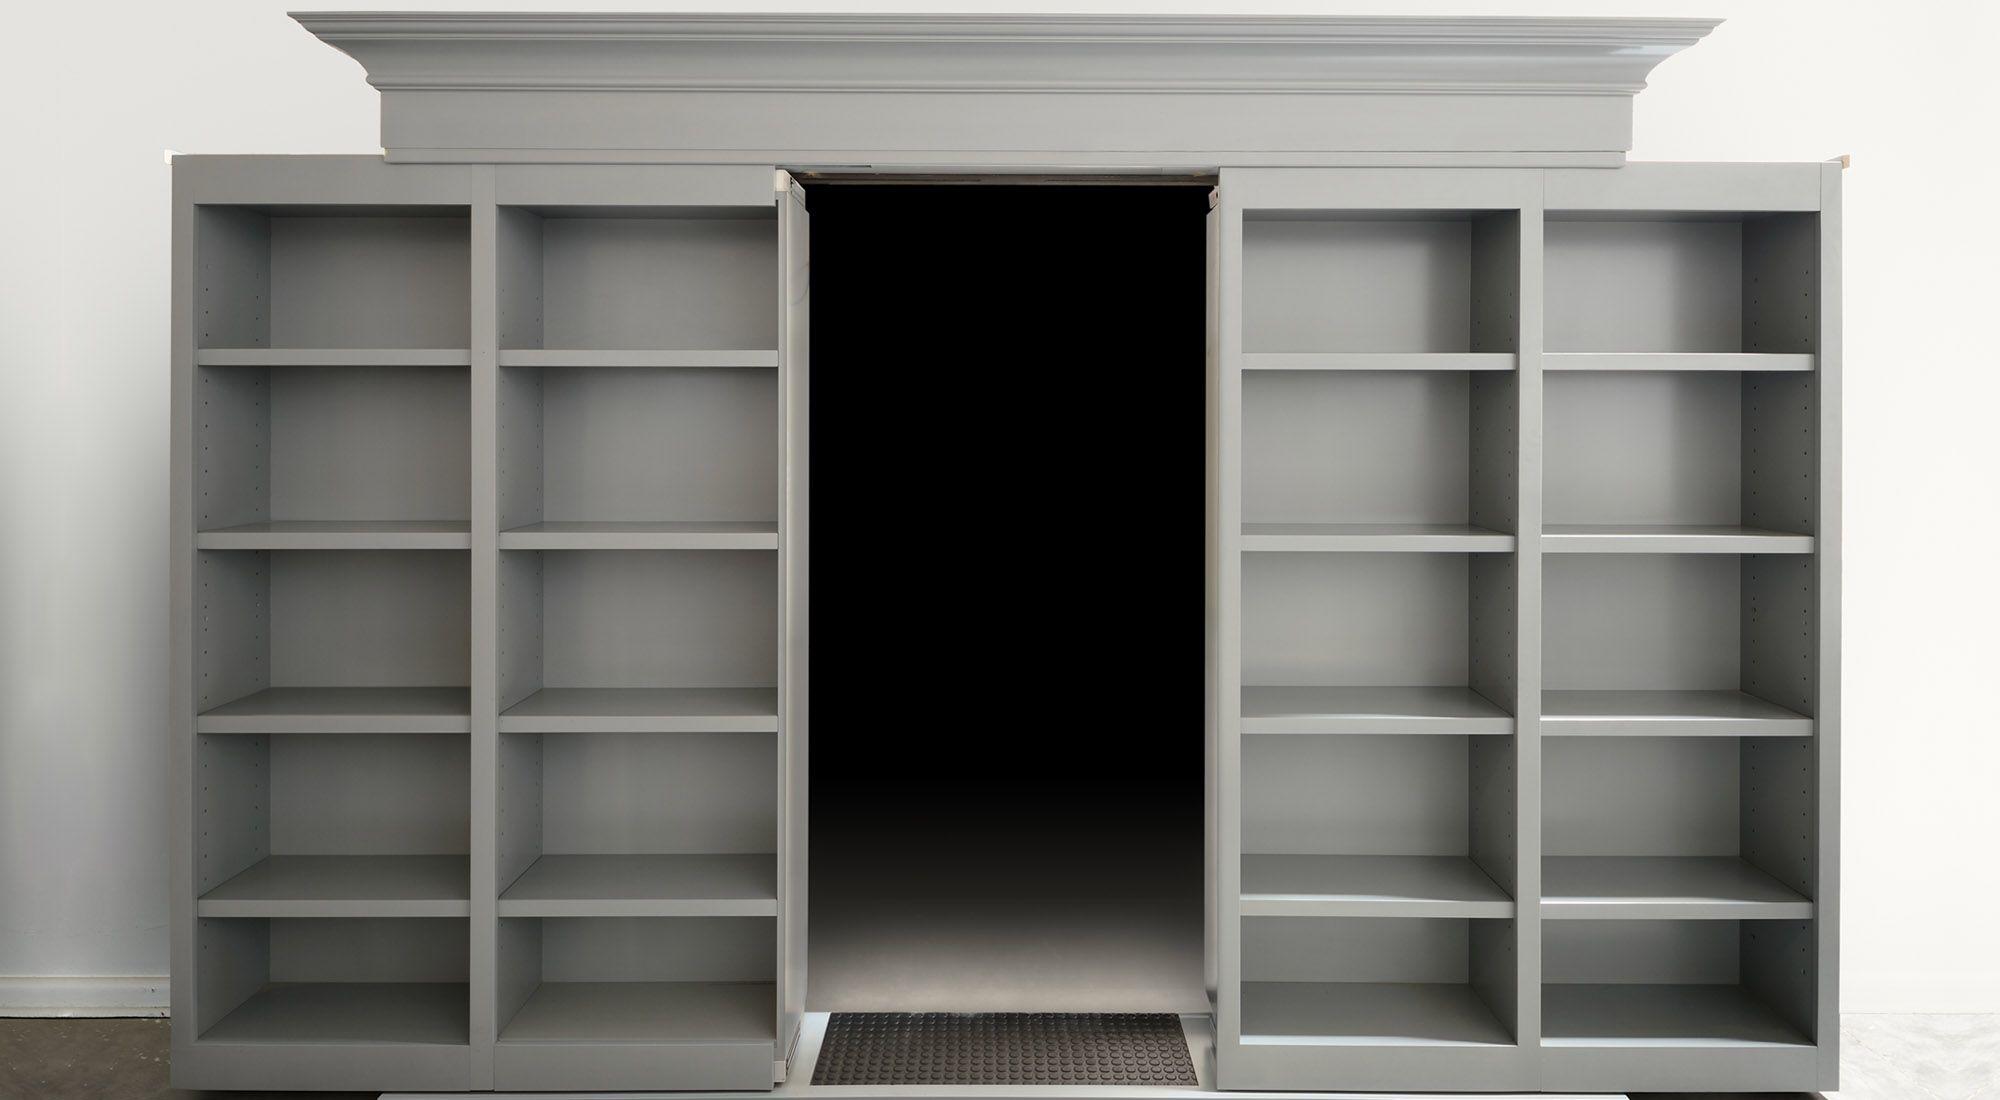 inside to make secret regard hardware architecture bookcase with doors in a closet pub bookshelf hidden residence decorating door the plan from geek